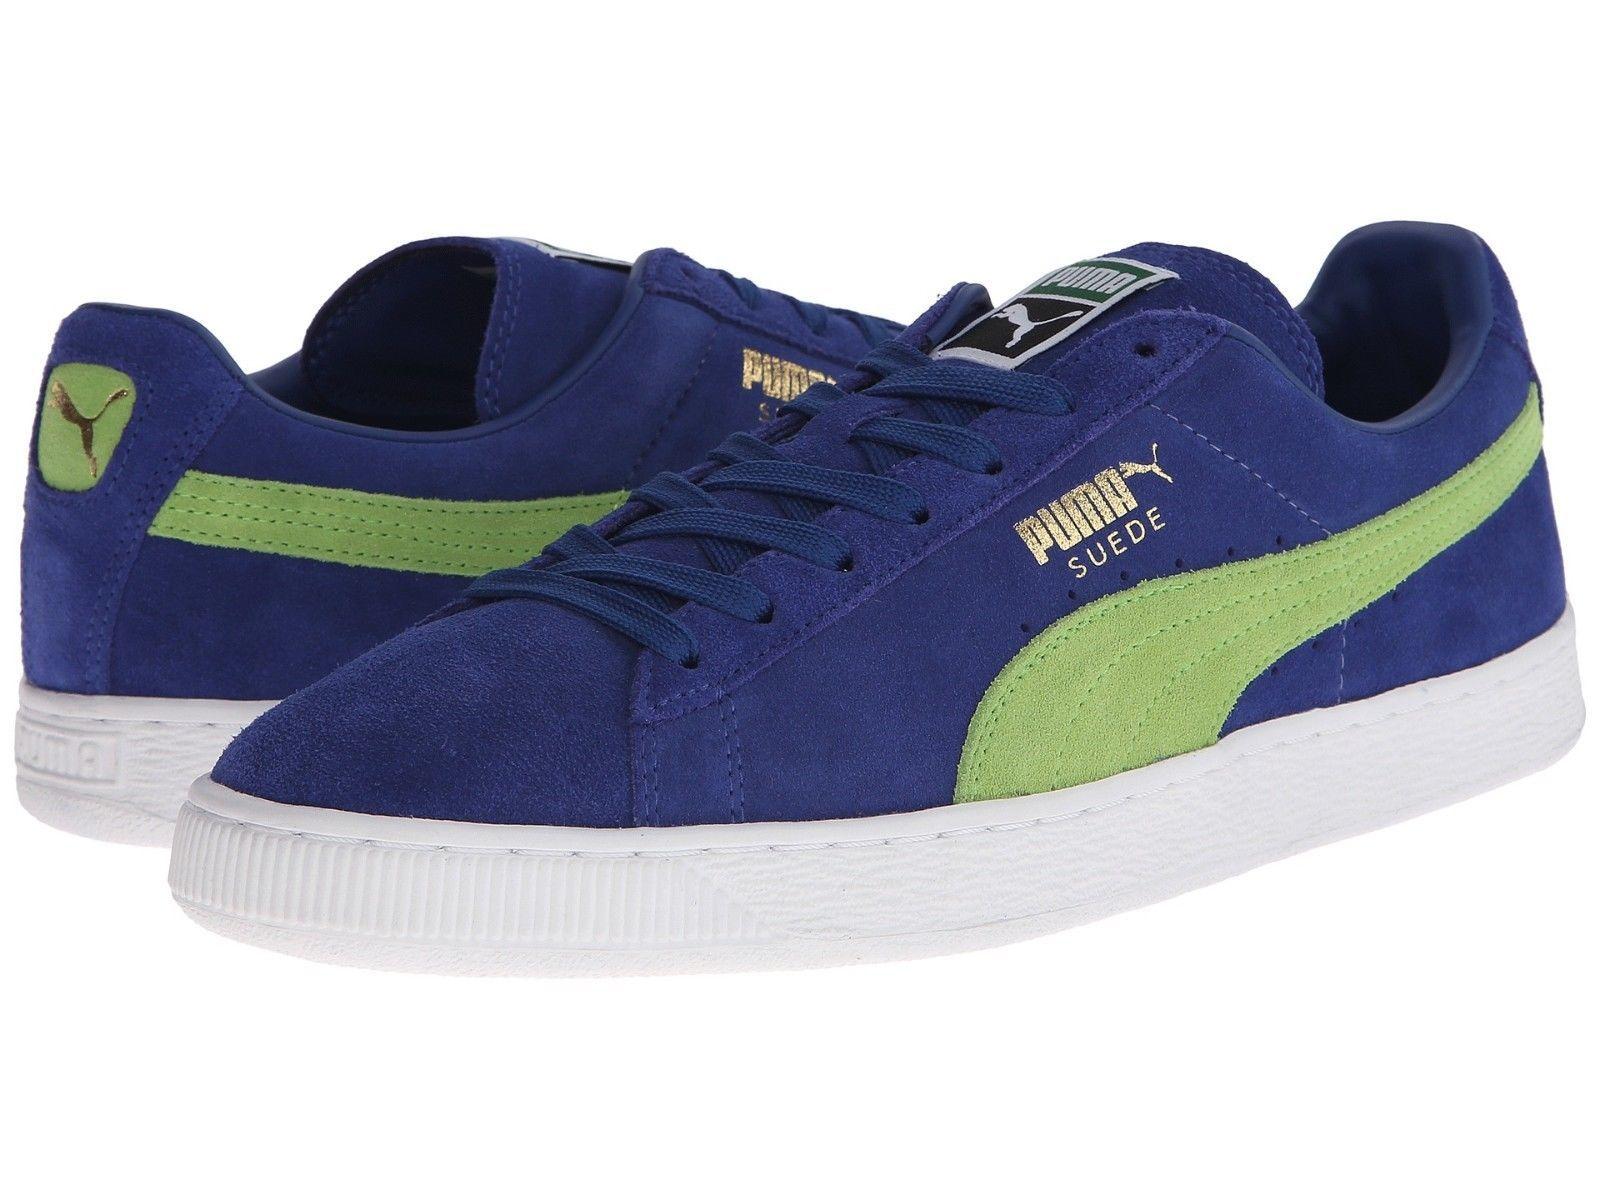 8de5dad0eb70cc Men s PUMA Suede Classic+ Shoes